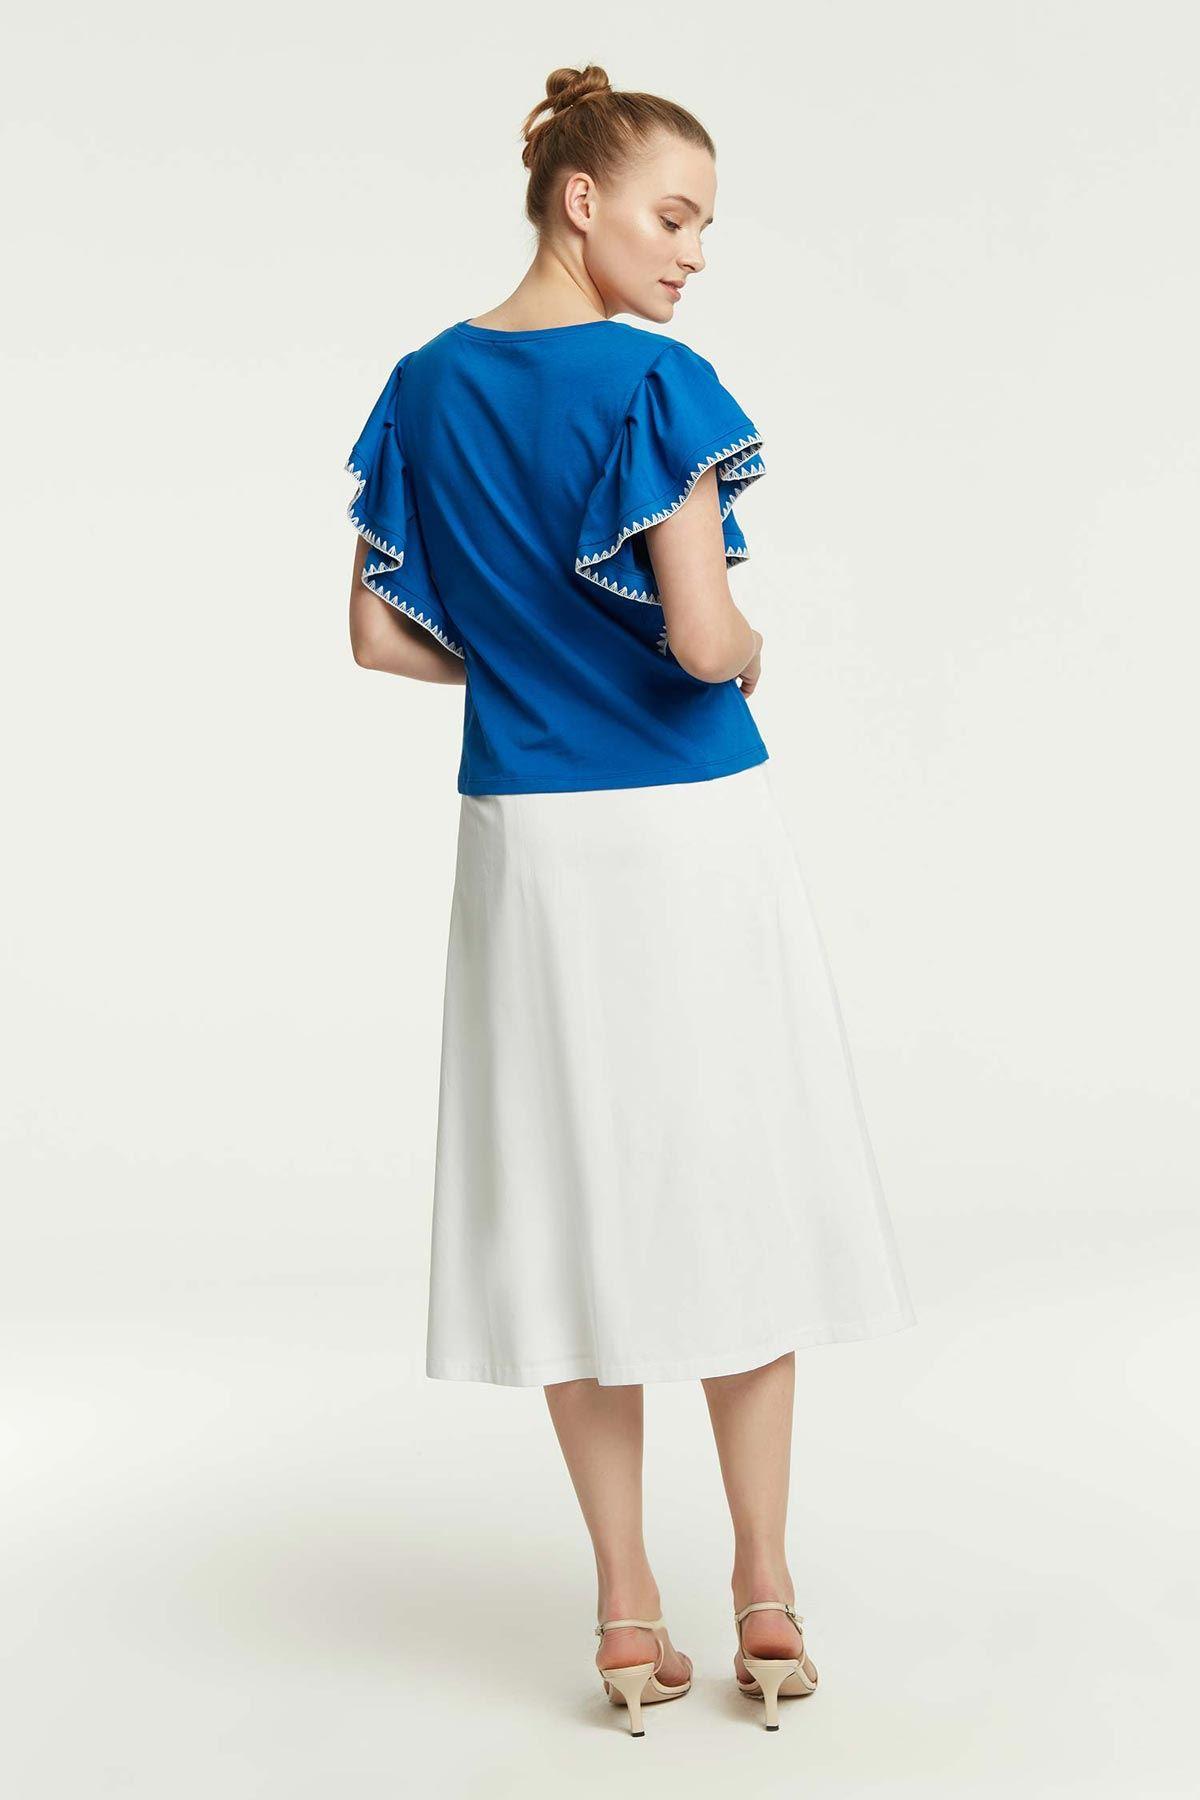 Kol Fırfırlı T-Shirt Saks